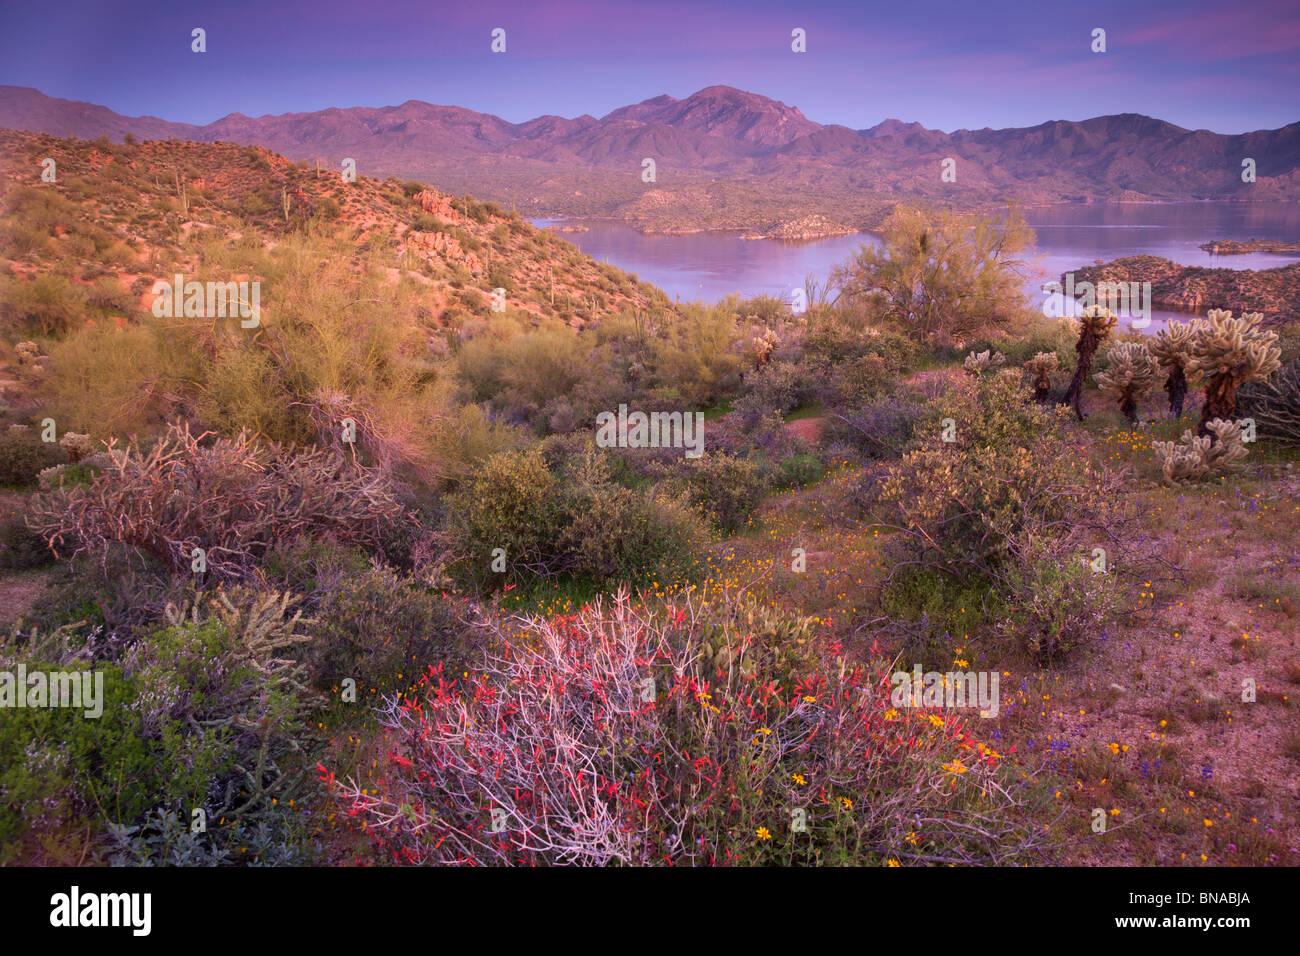 Wildflowers along Bartlett Lake, Tonto National Forest, near Phoenix, Arizona. - Stock Image